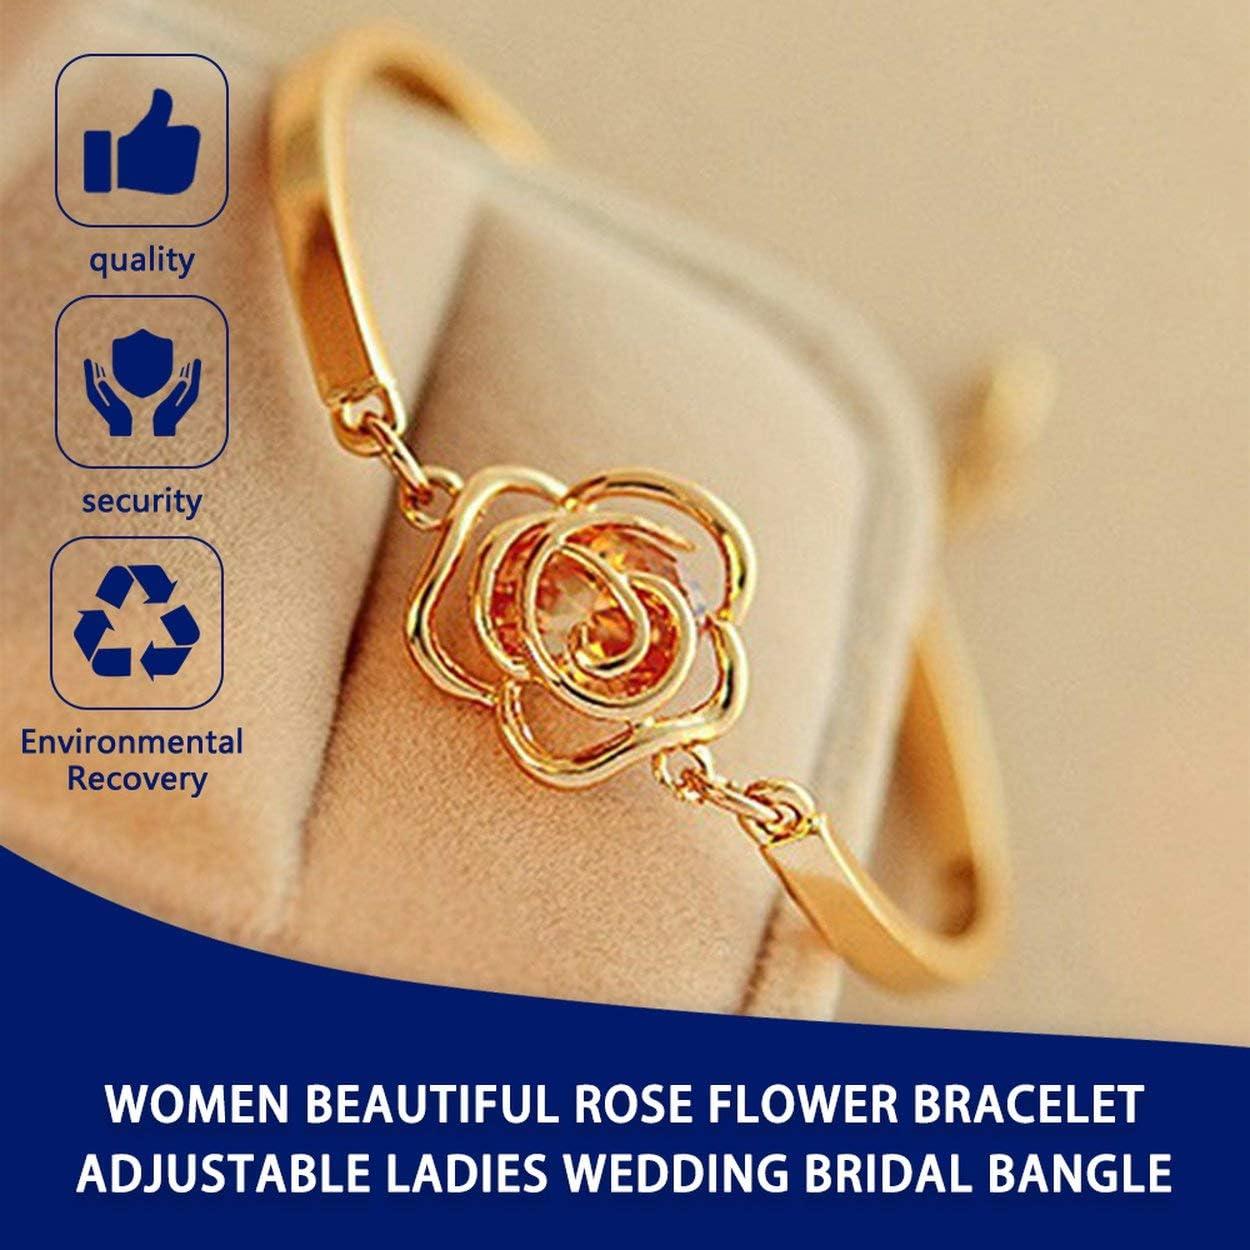 Korean Fashionable Women Beautiful Rose Flower Charm Bracelet Adjustable Ladies Wedding Bridal Bracelet Bangle Jewelry